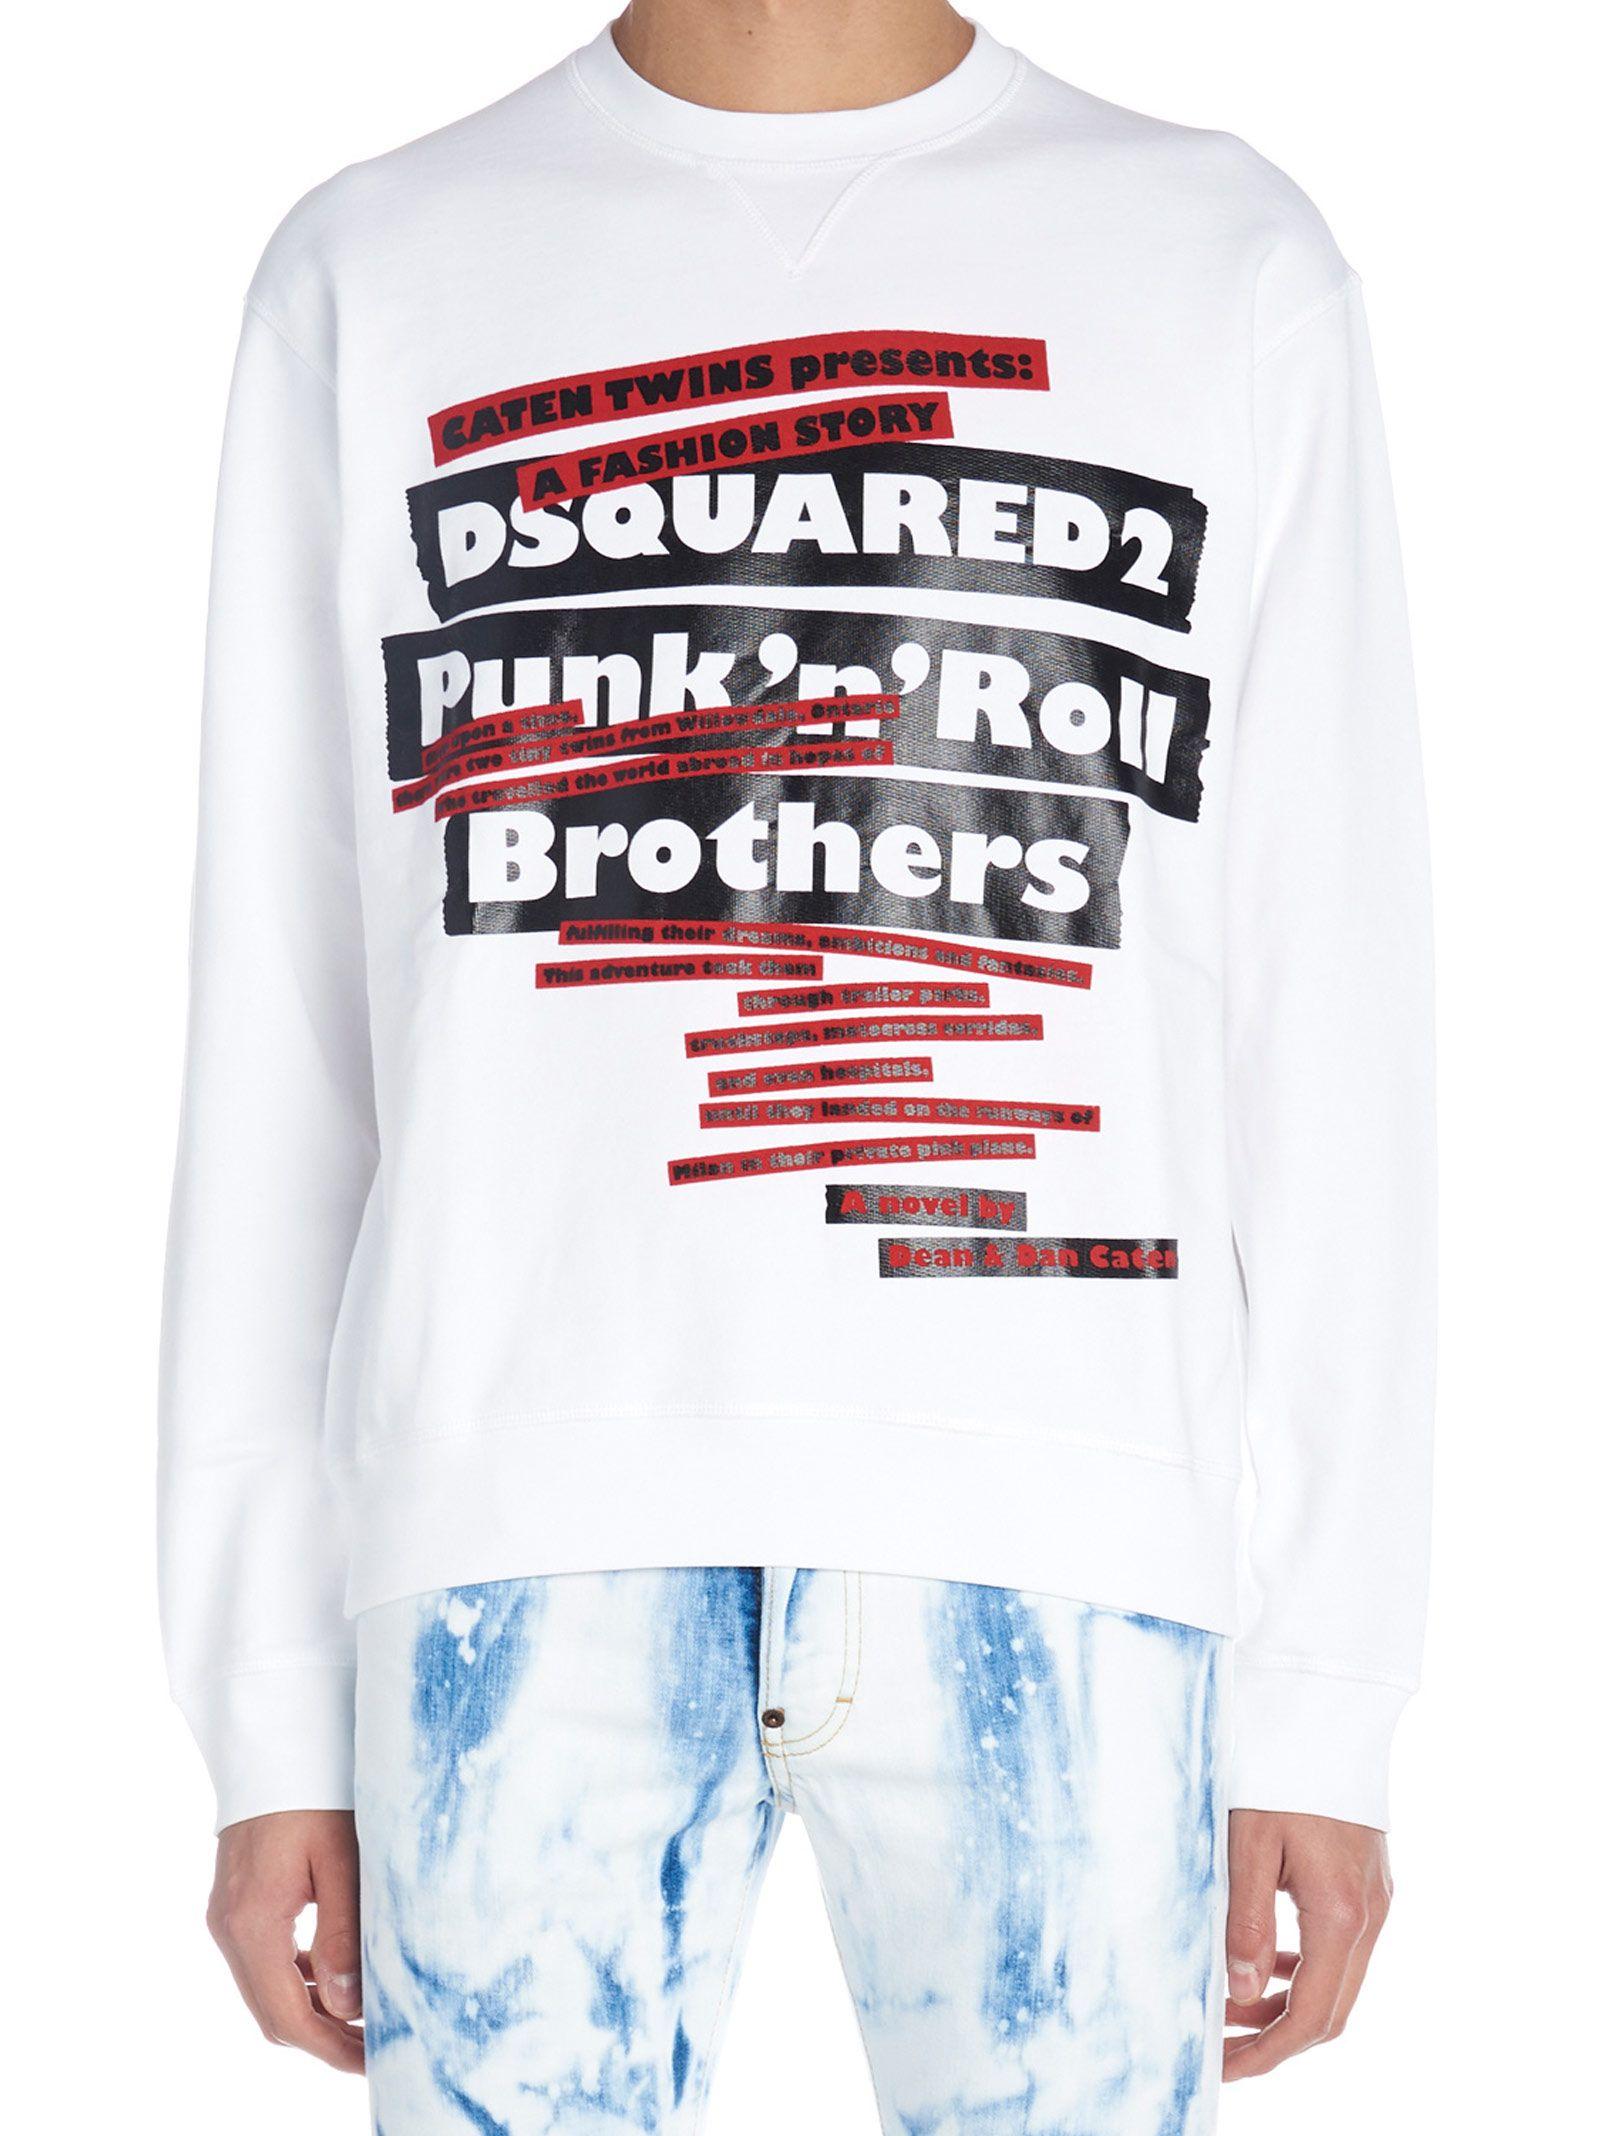 Dsquared2 'logo Punk' Sweatshirt